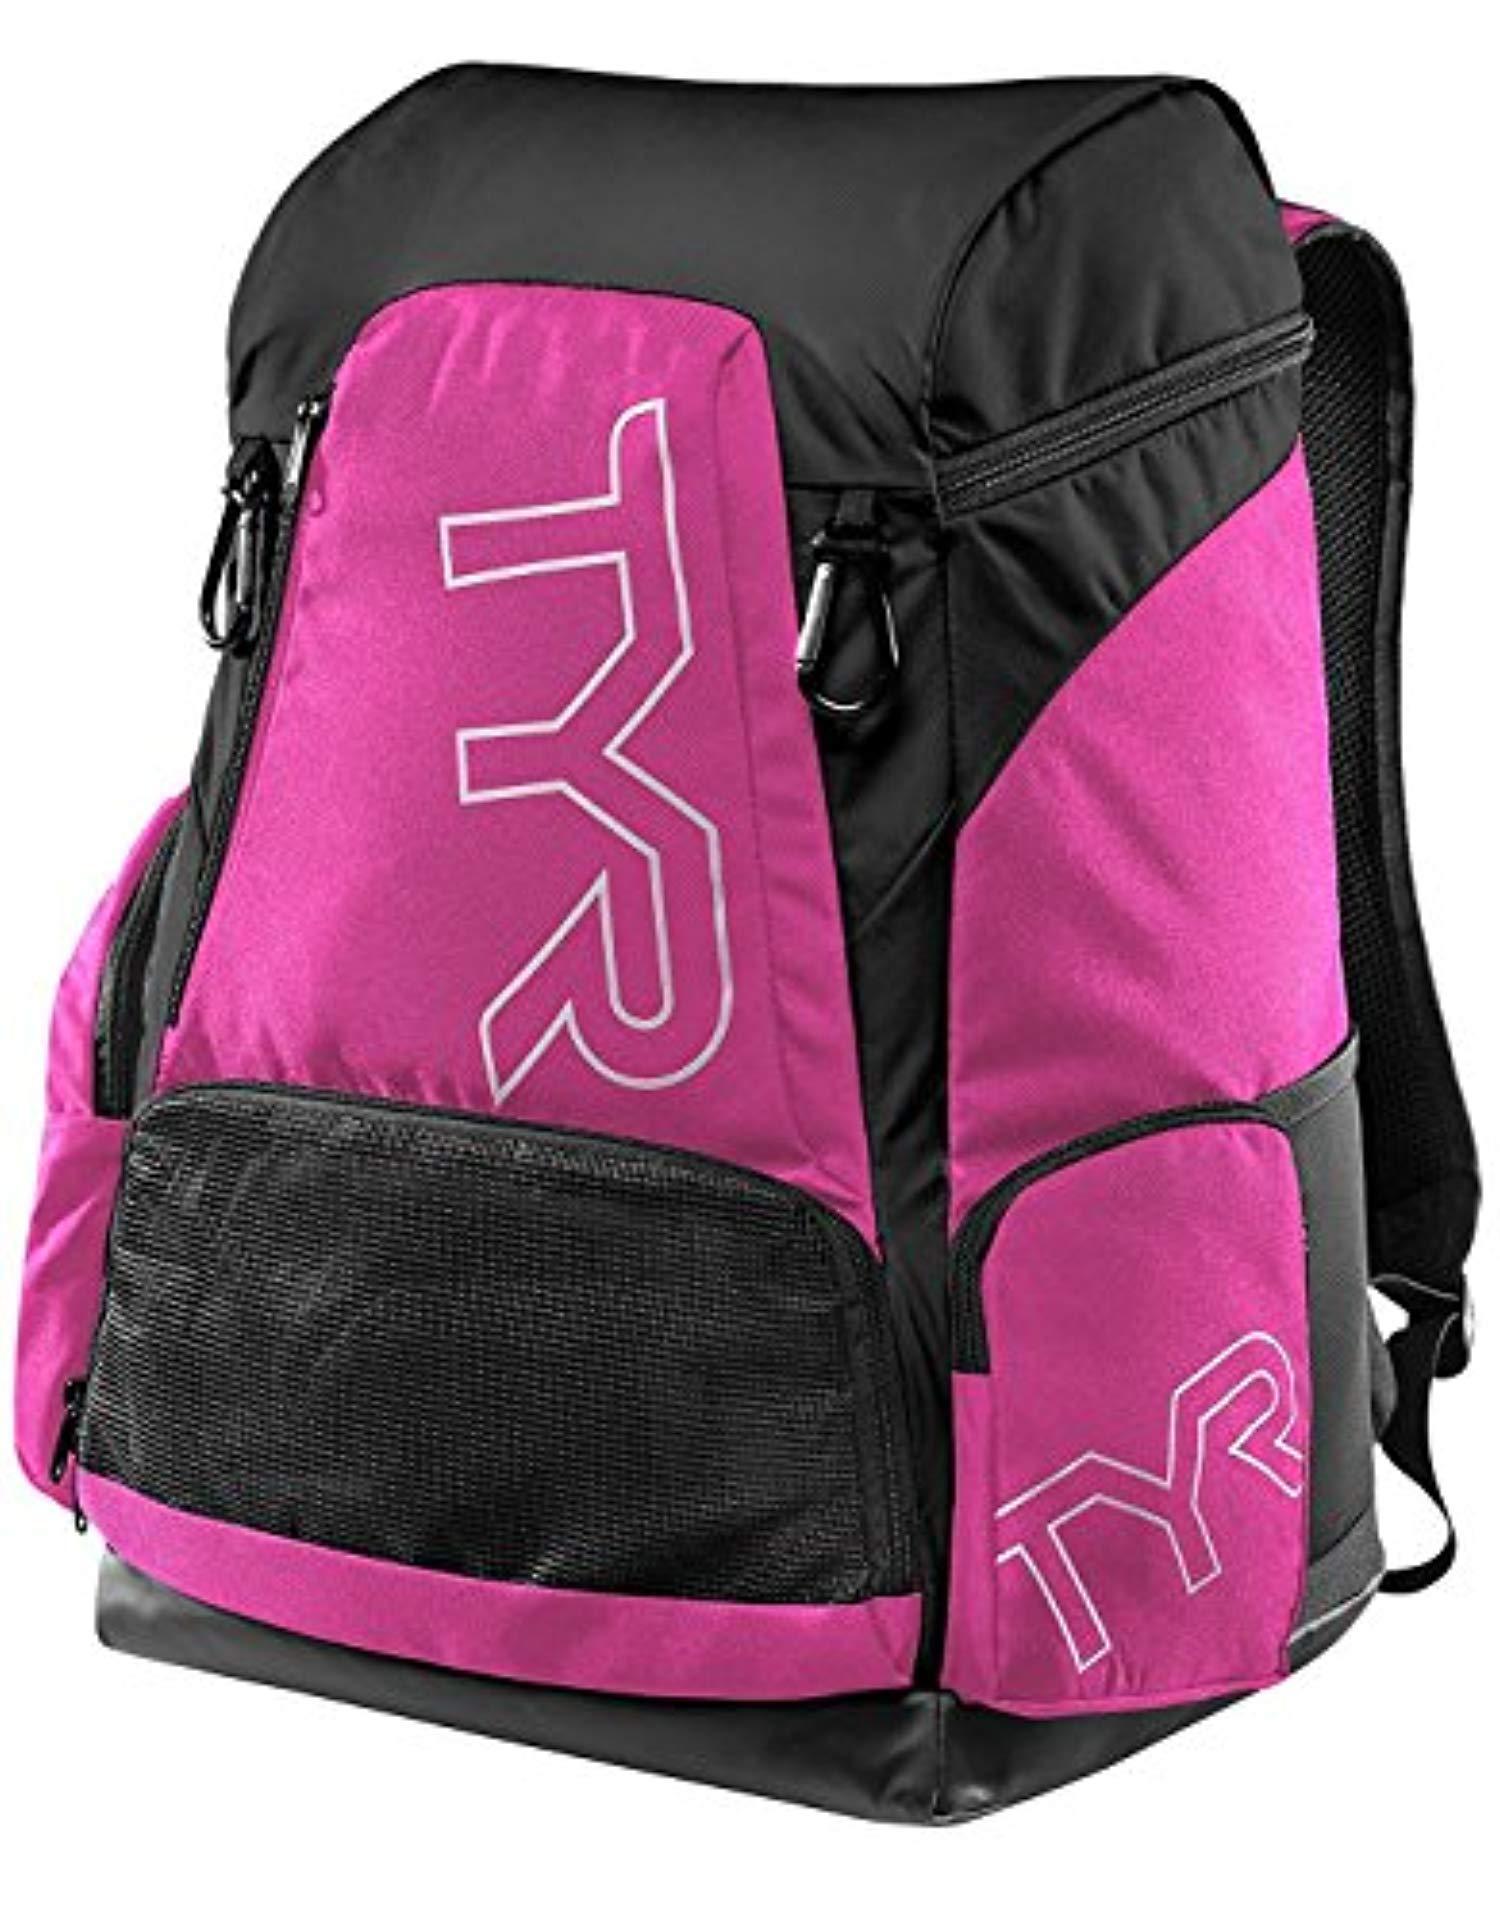 Swim Bundle: TYR Alliance 45L Backpack Pink/Black All & Swimming Earplugs by Competition Swimwear